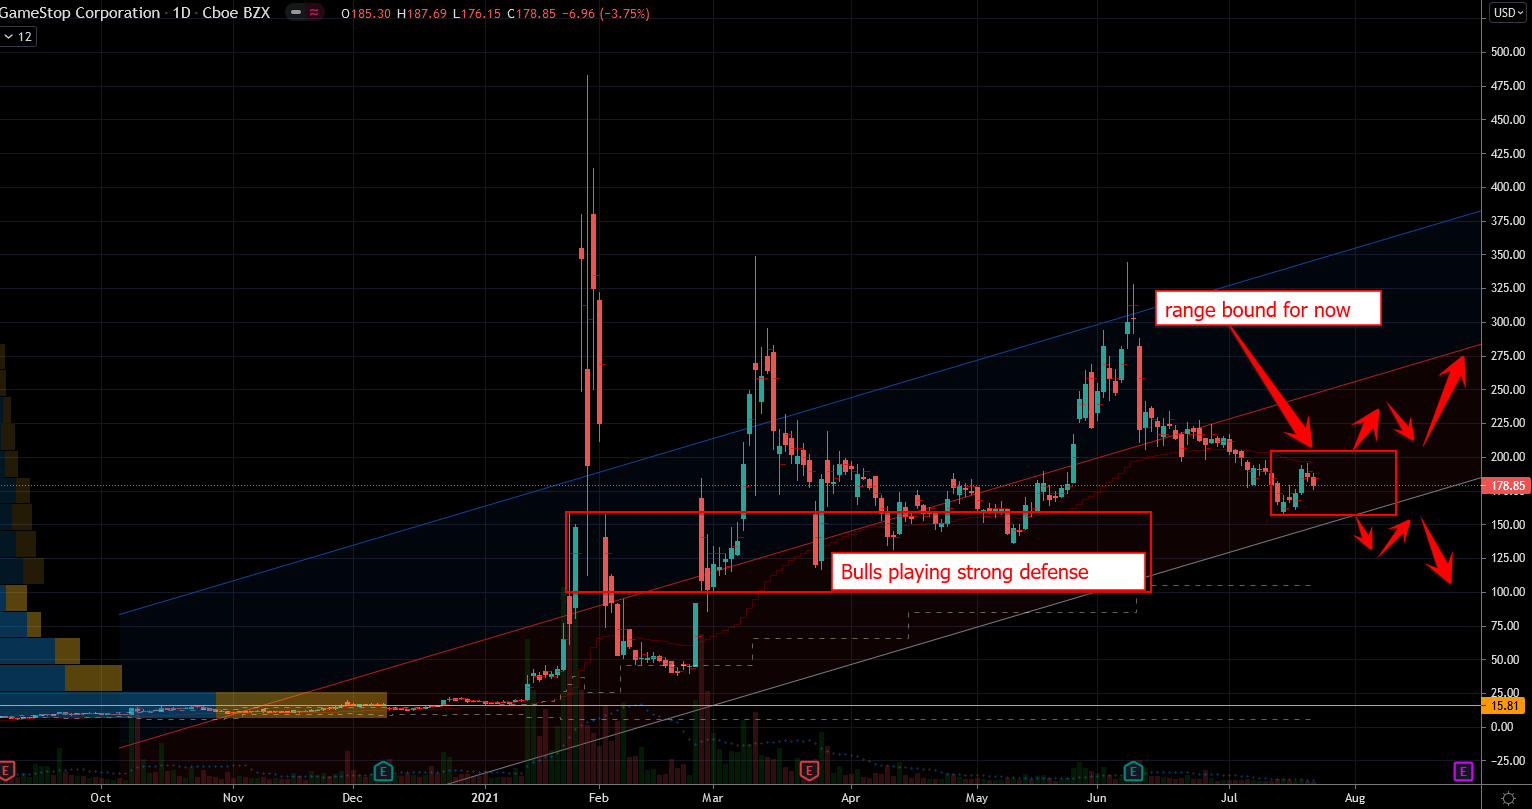 GameStop (GME) Stock Chart Showing Trading Range